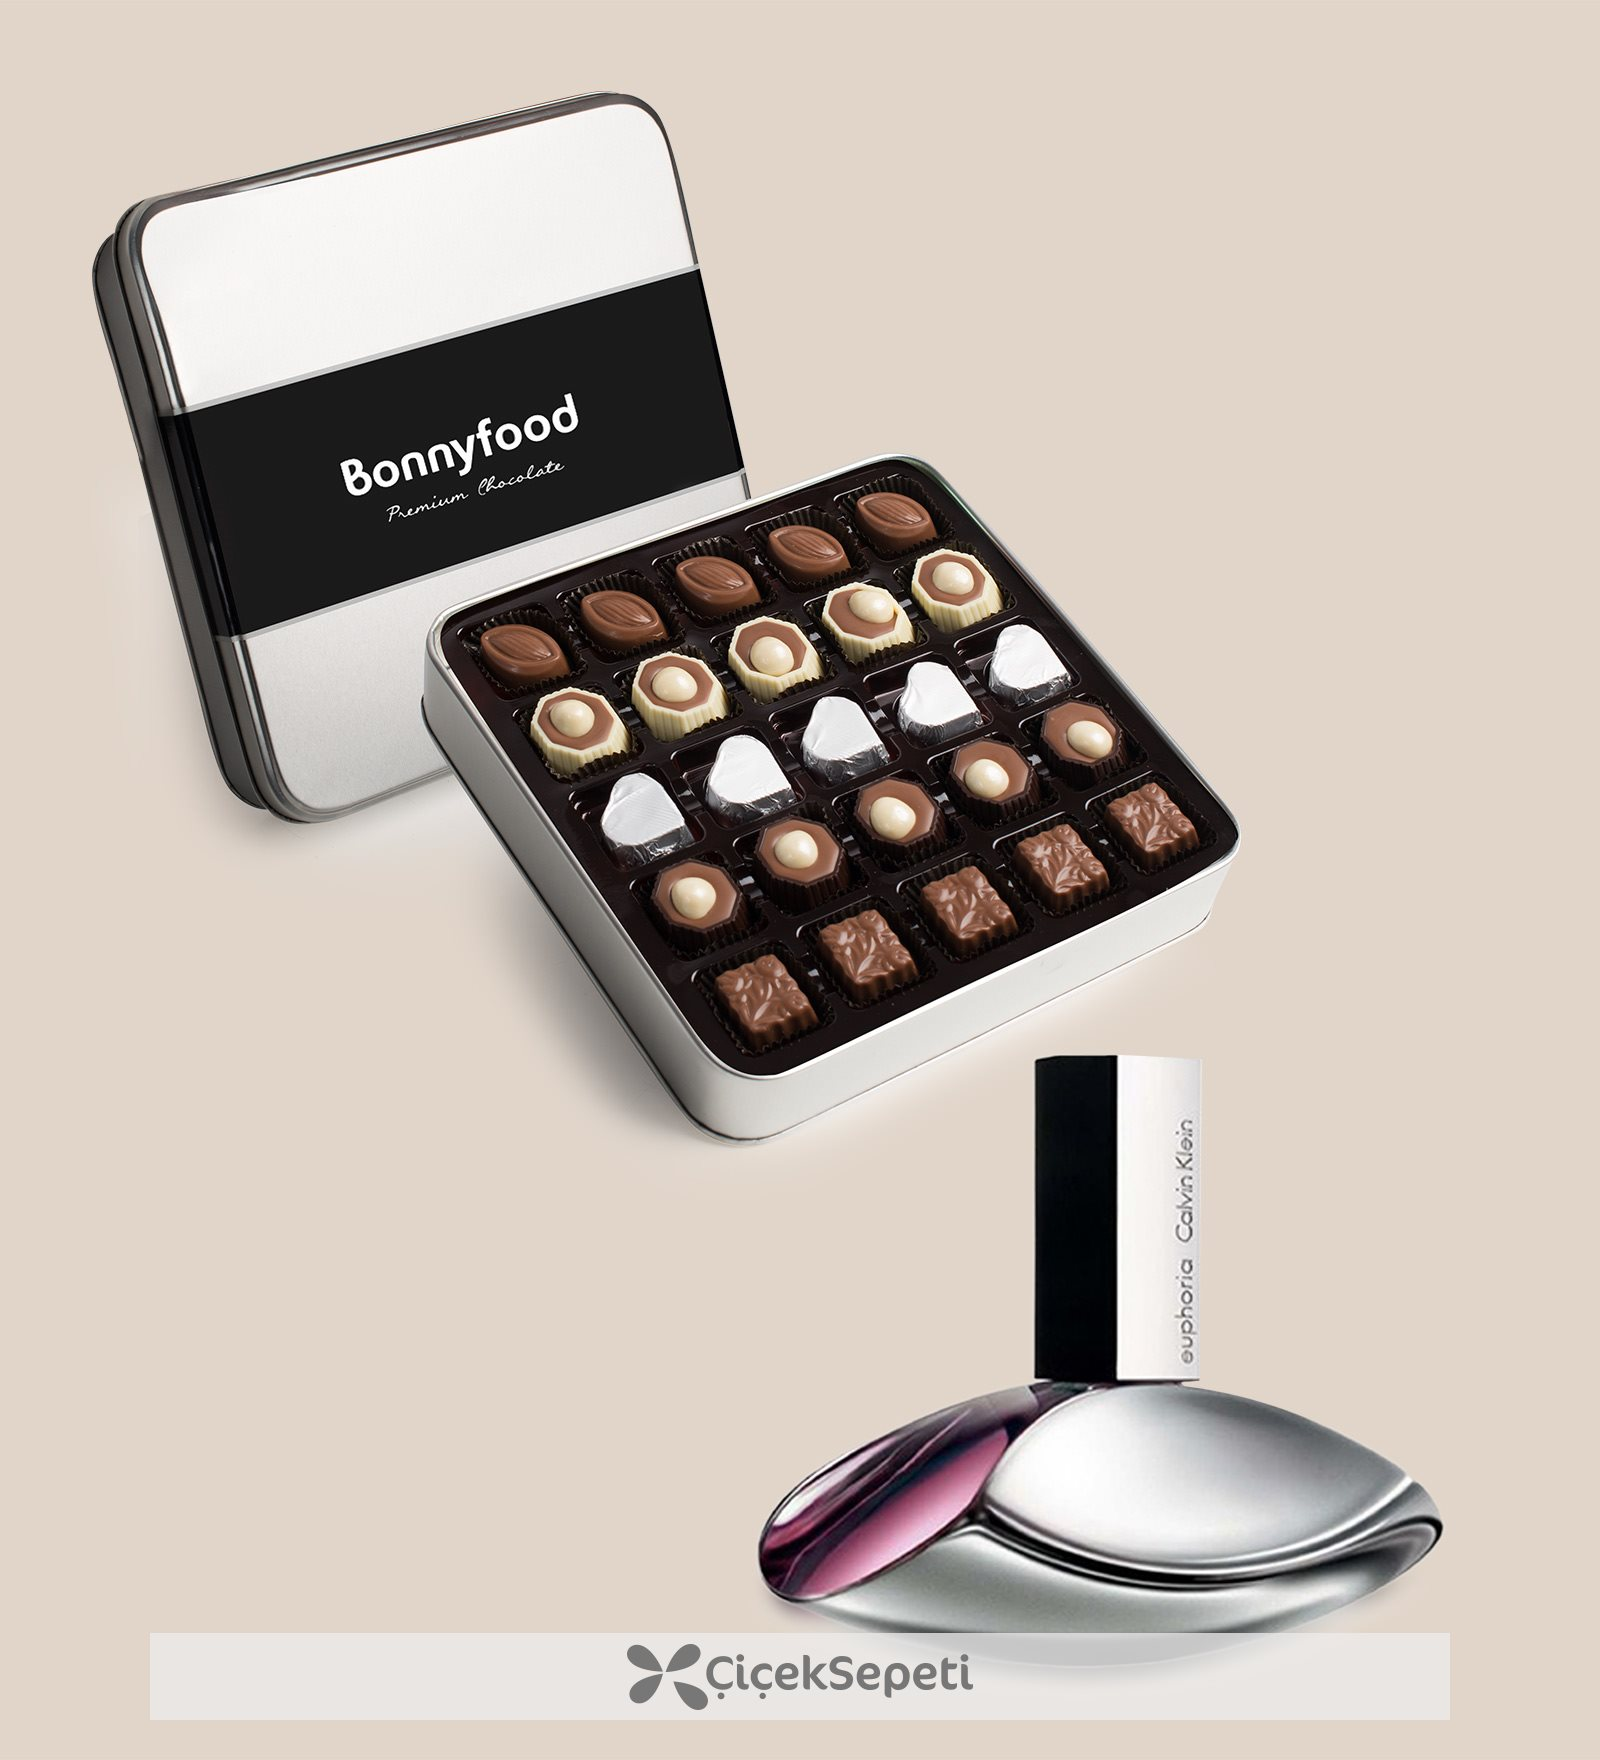 Calvin Klein Euphoria Edp 100 Ml Kadn Parfüm Fiyat - Hepsiburada